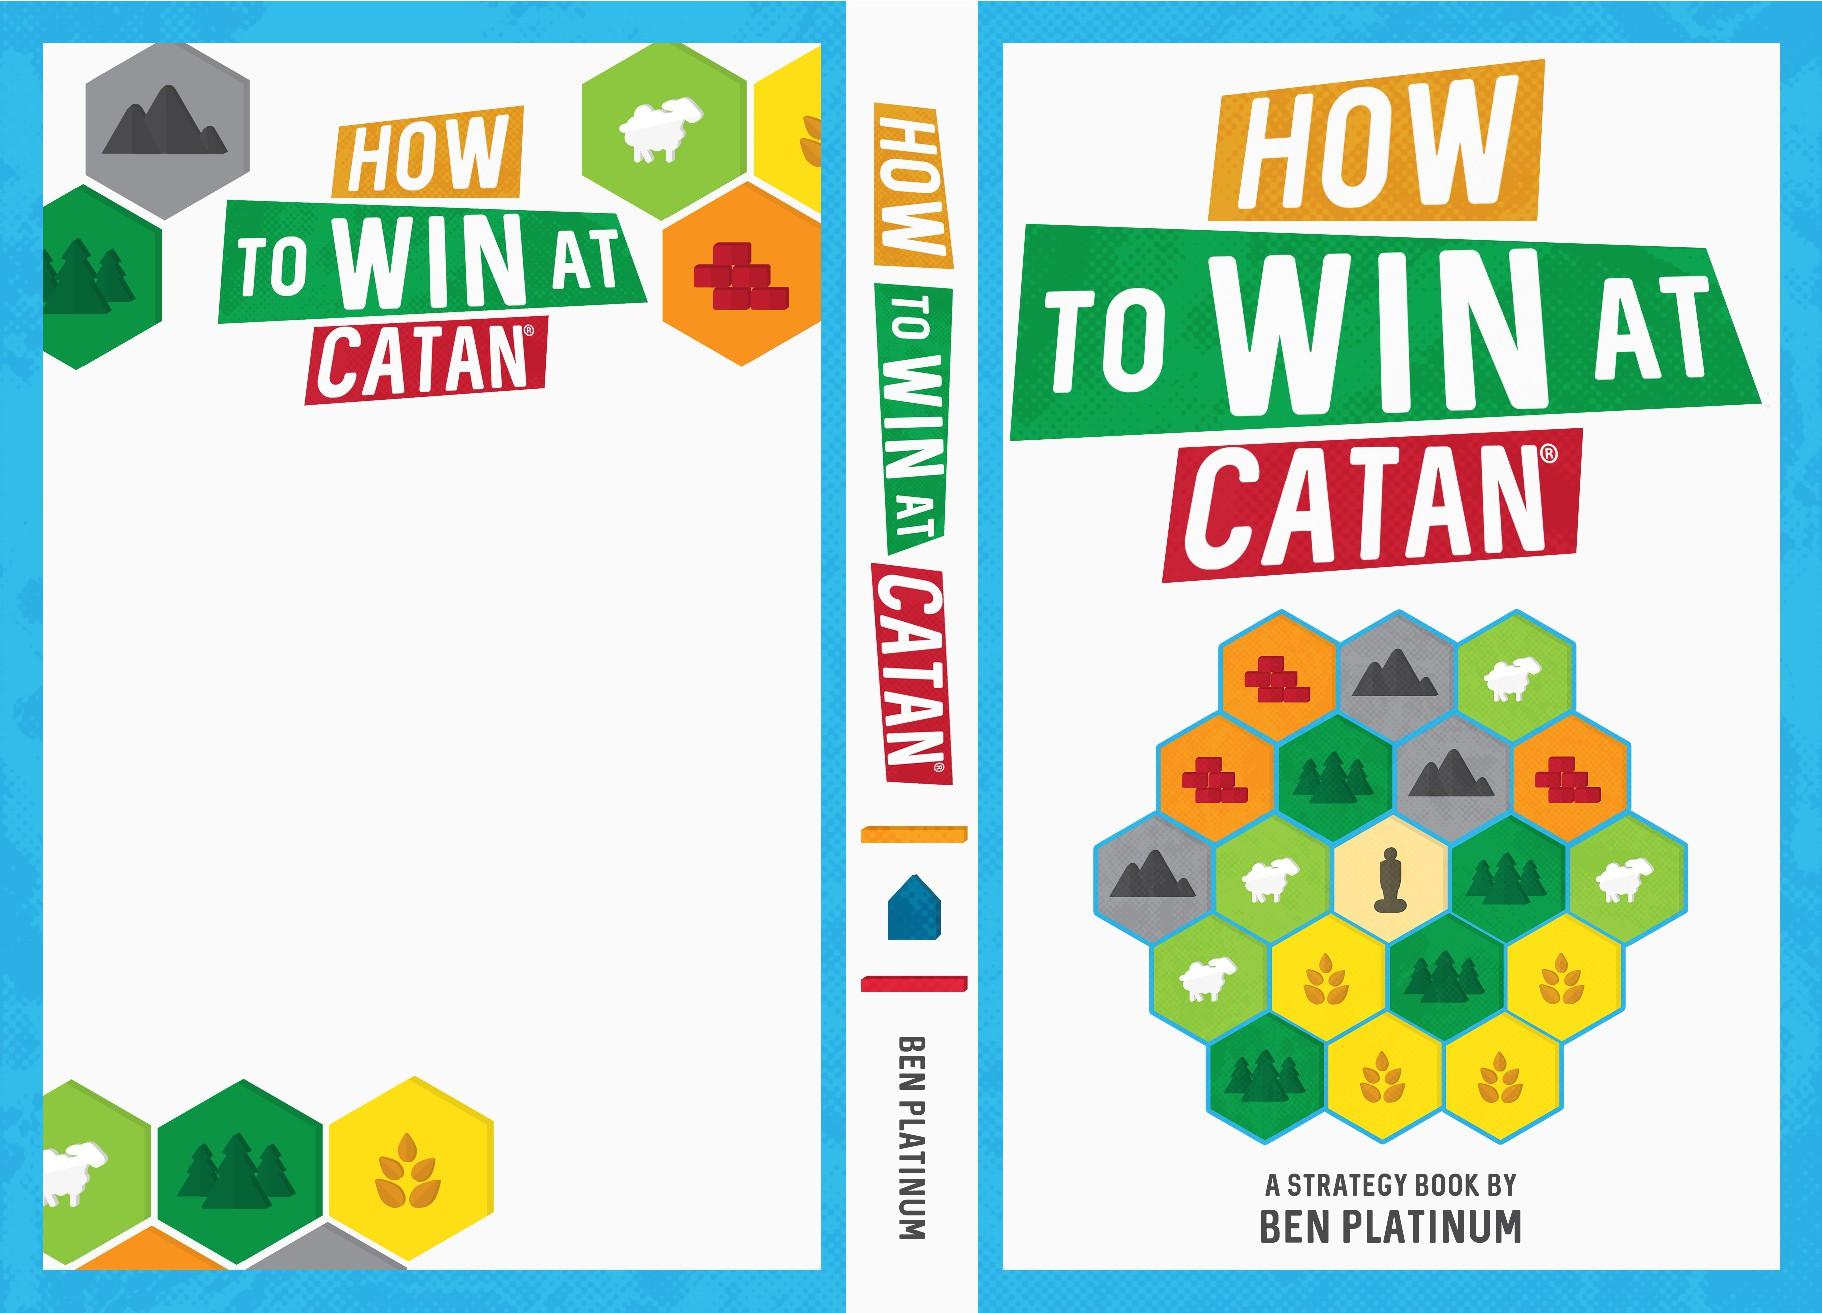 Catan strategy book